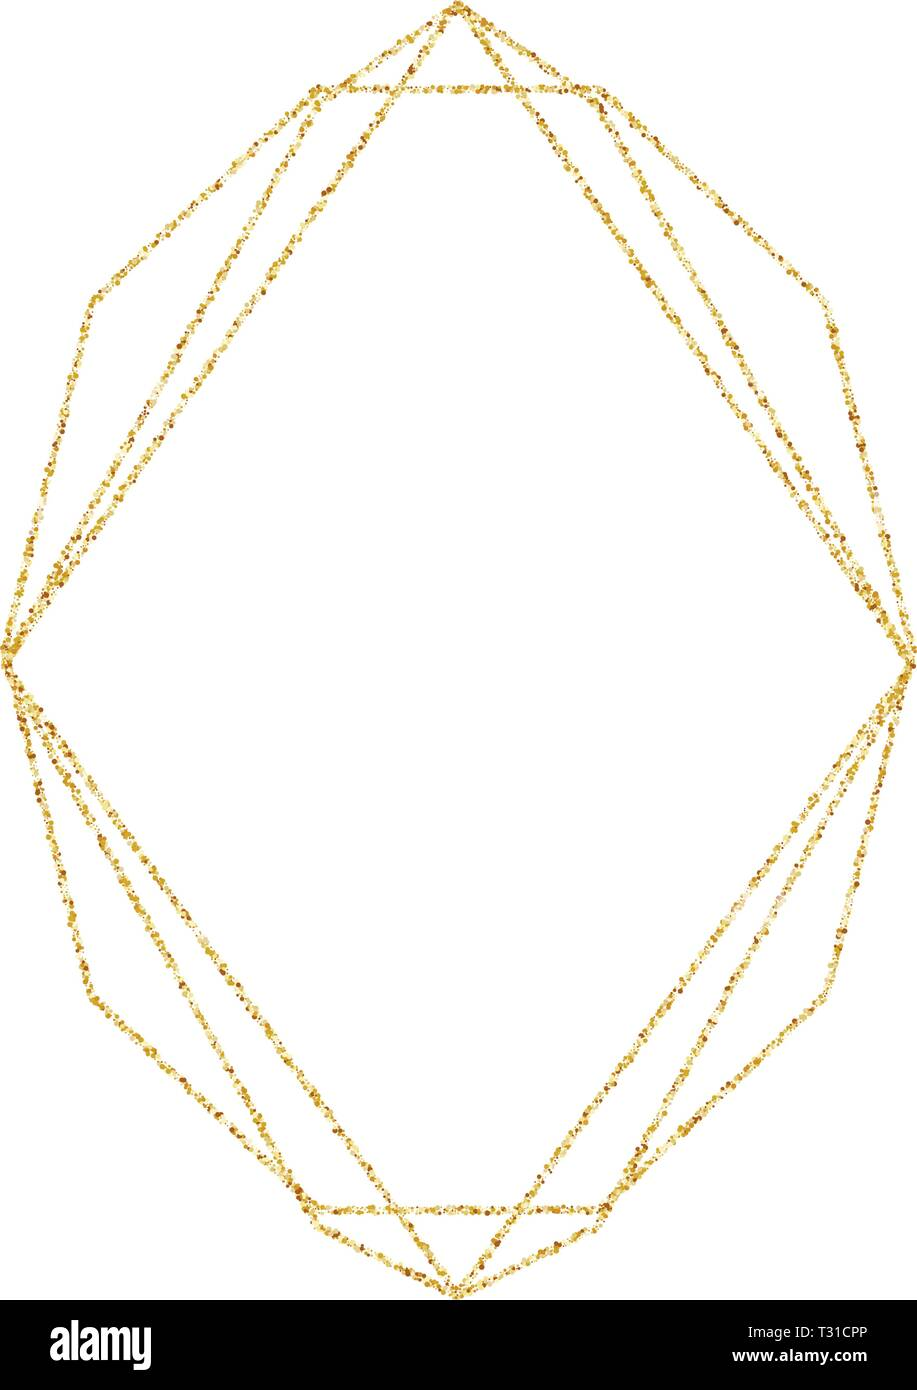 Marco Dorado Geométrica Para Bodas O De Invitación De